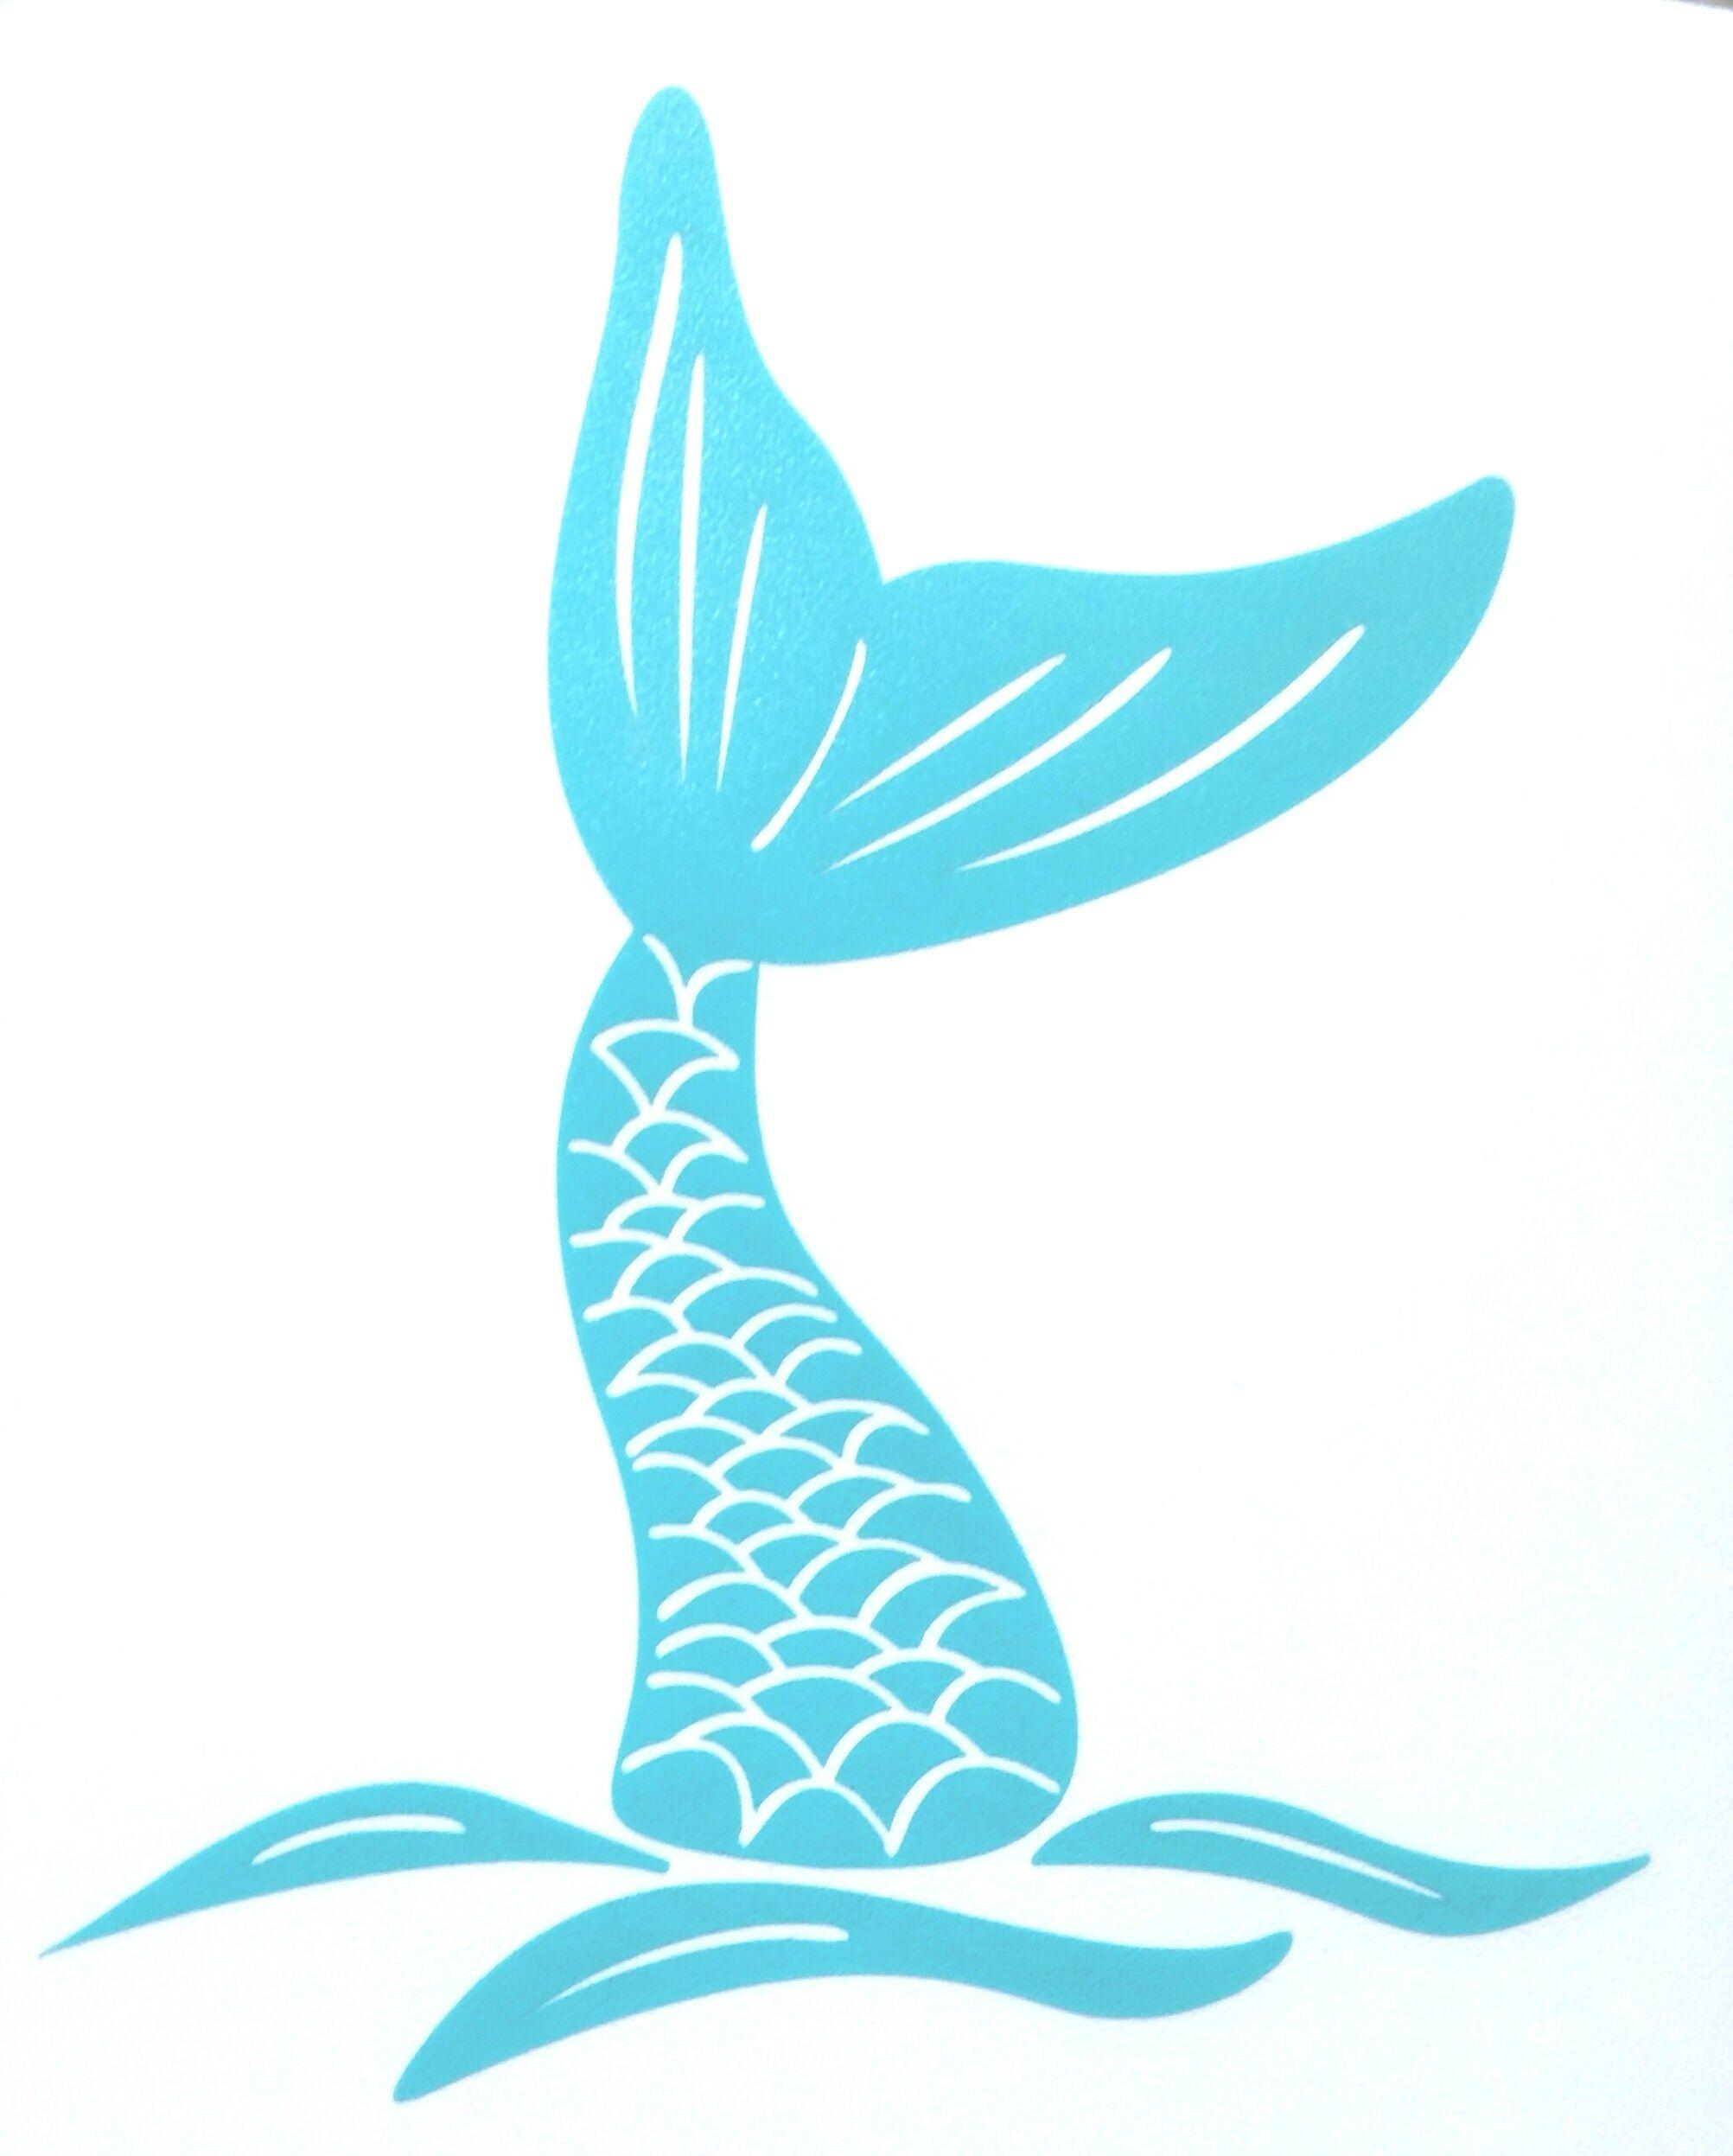 Mermaid Tail Decal / Mermaid Decal / Car Decal /Yeti Decal